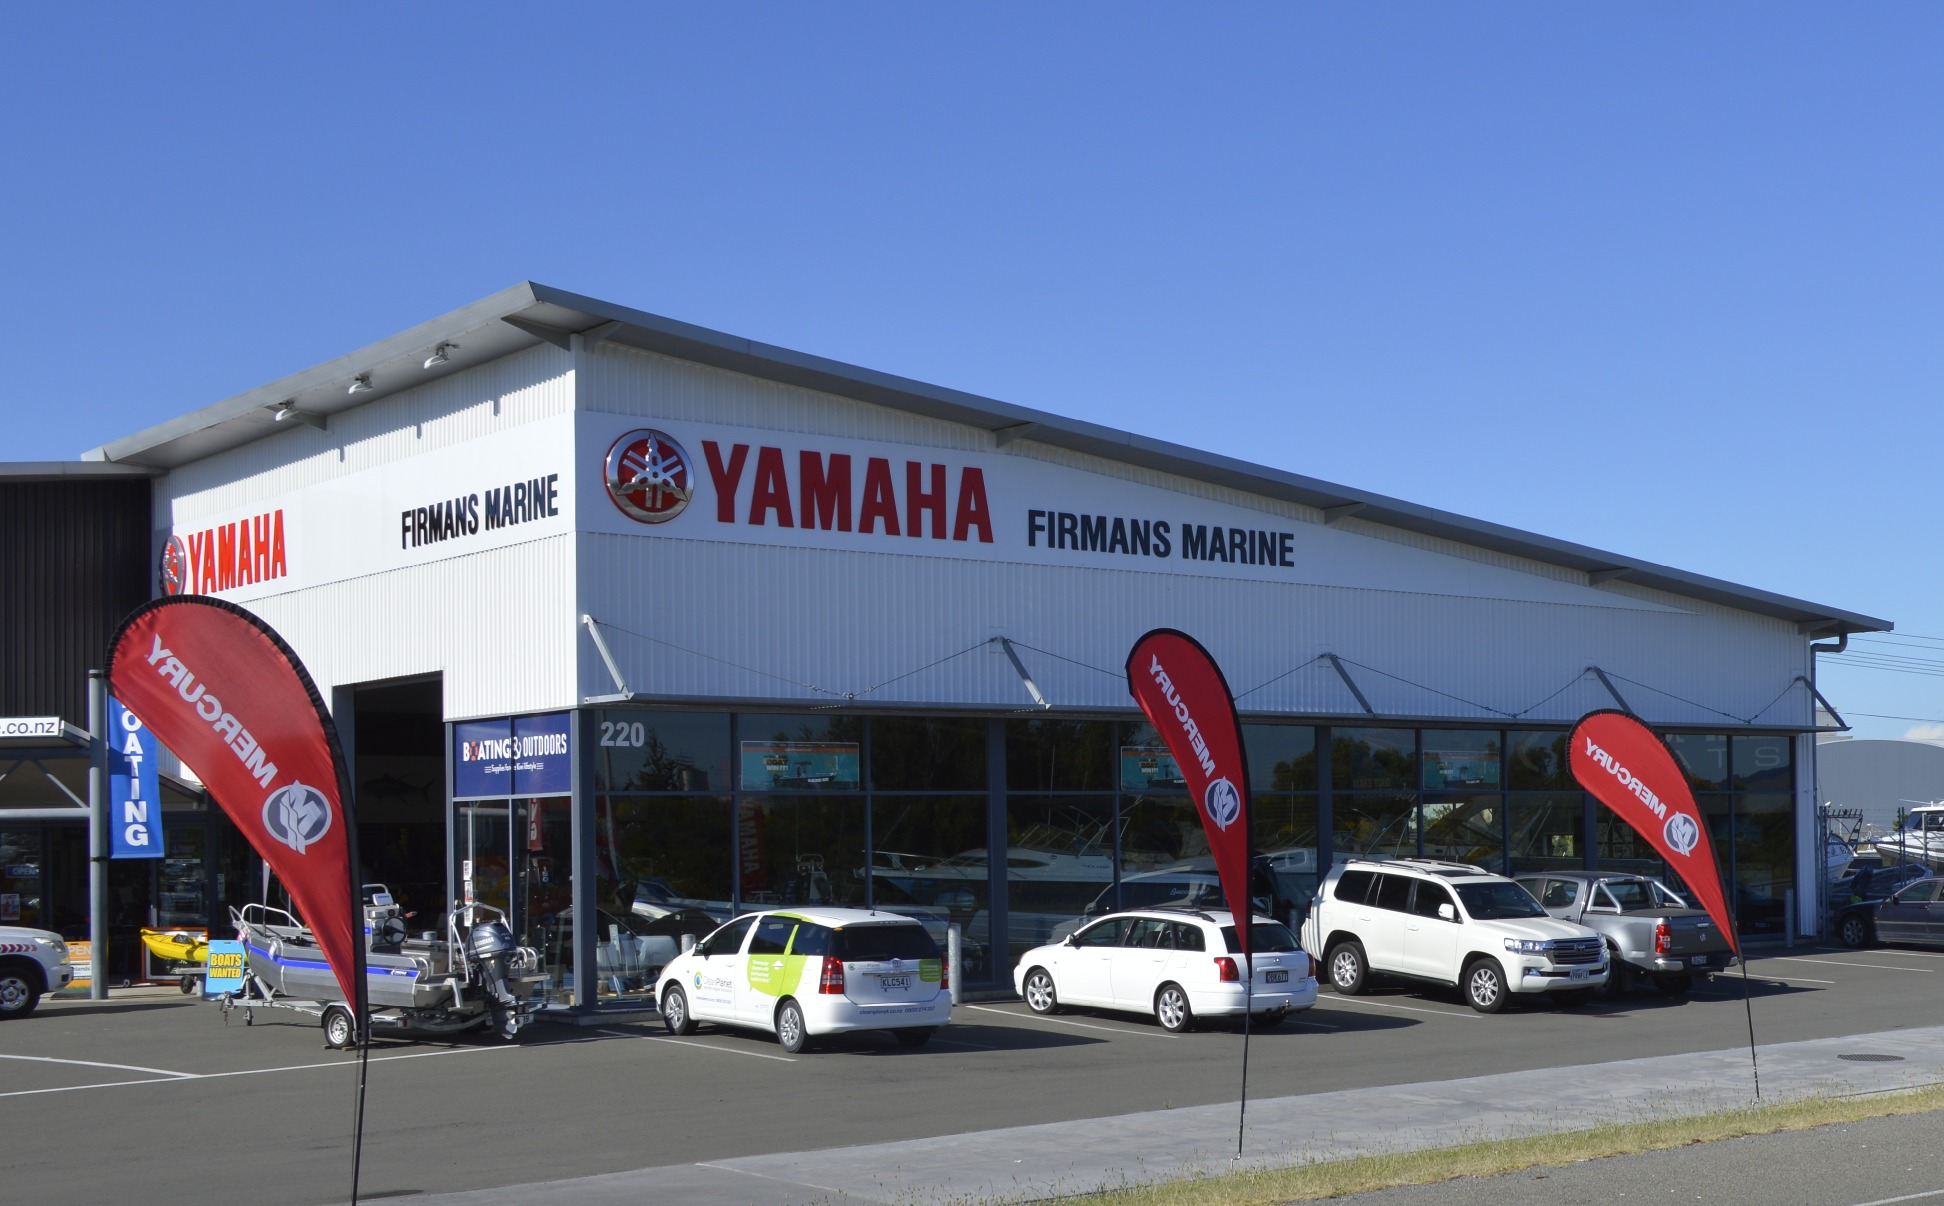 Firmans Marine, Yamaha